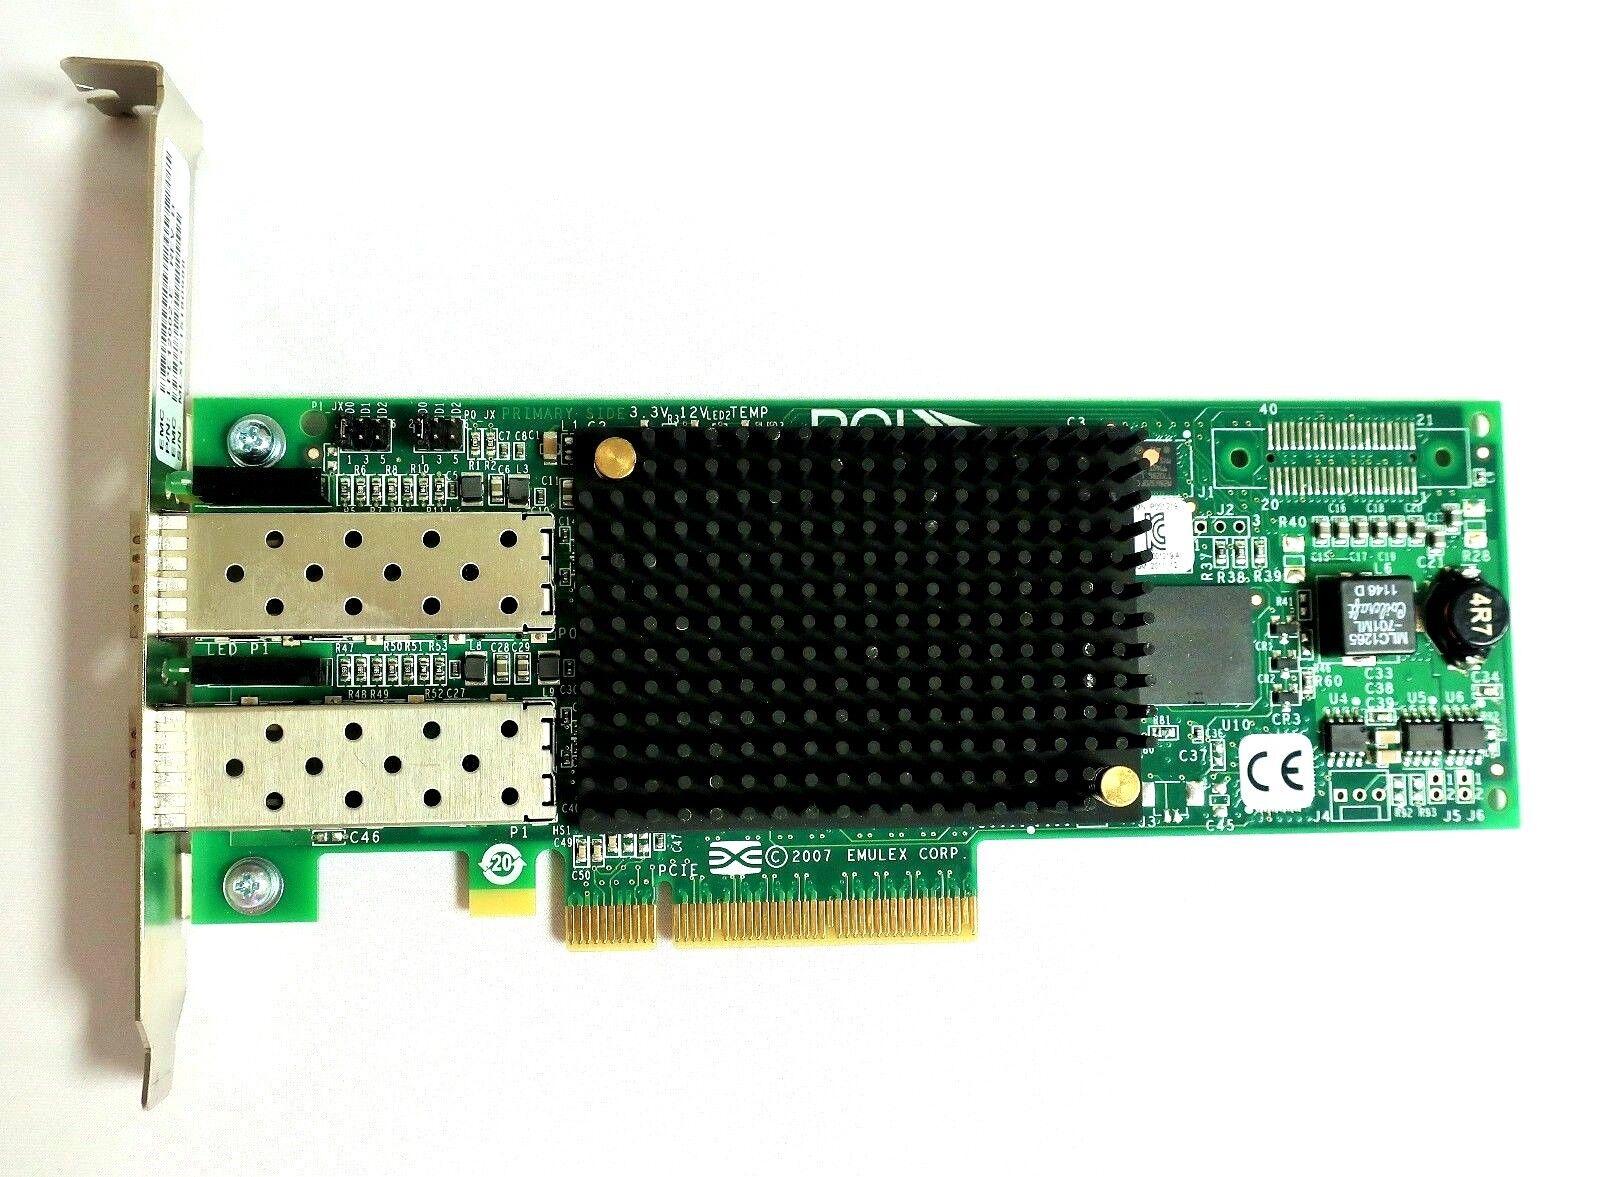 Emulex IBM 42D0500 LPE12002 8GB FC HBA 2 Port PCIe HP Dell Adapter Card High Pro